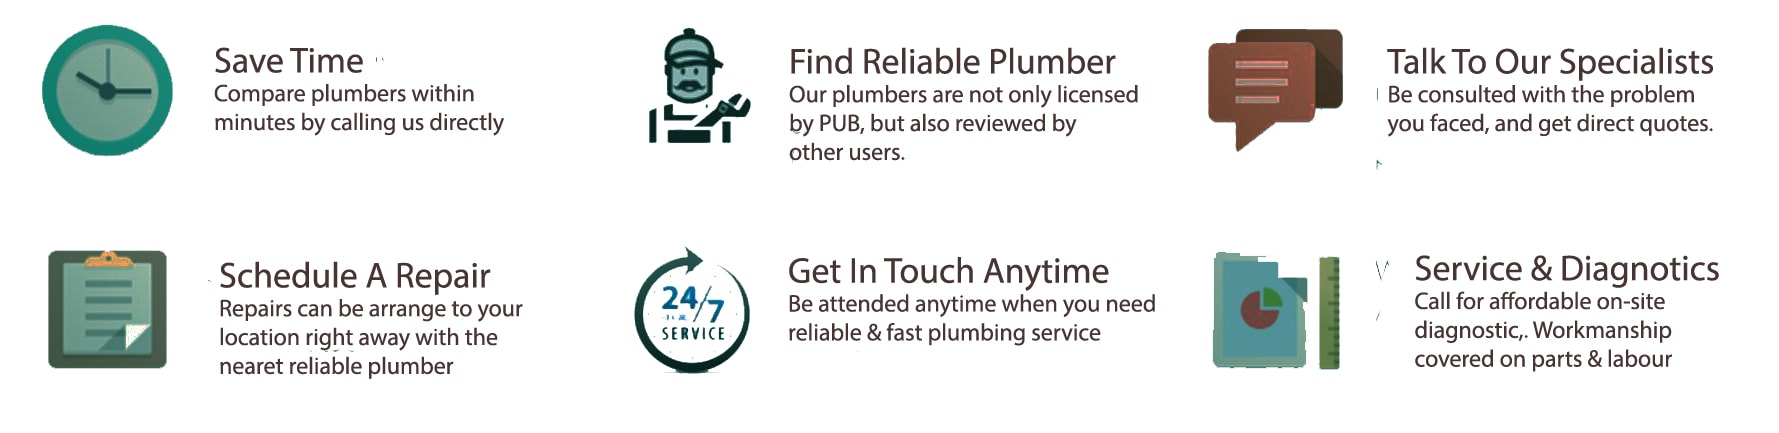 plumbing service singapore